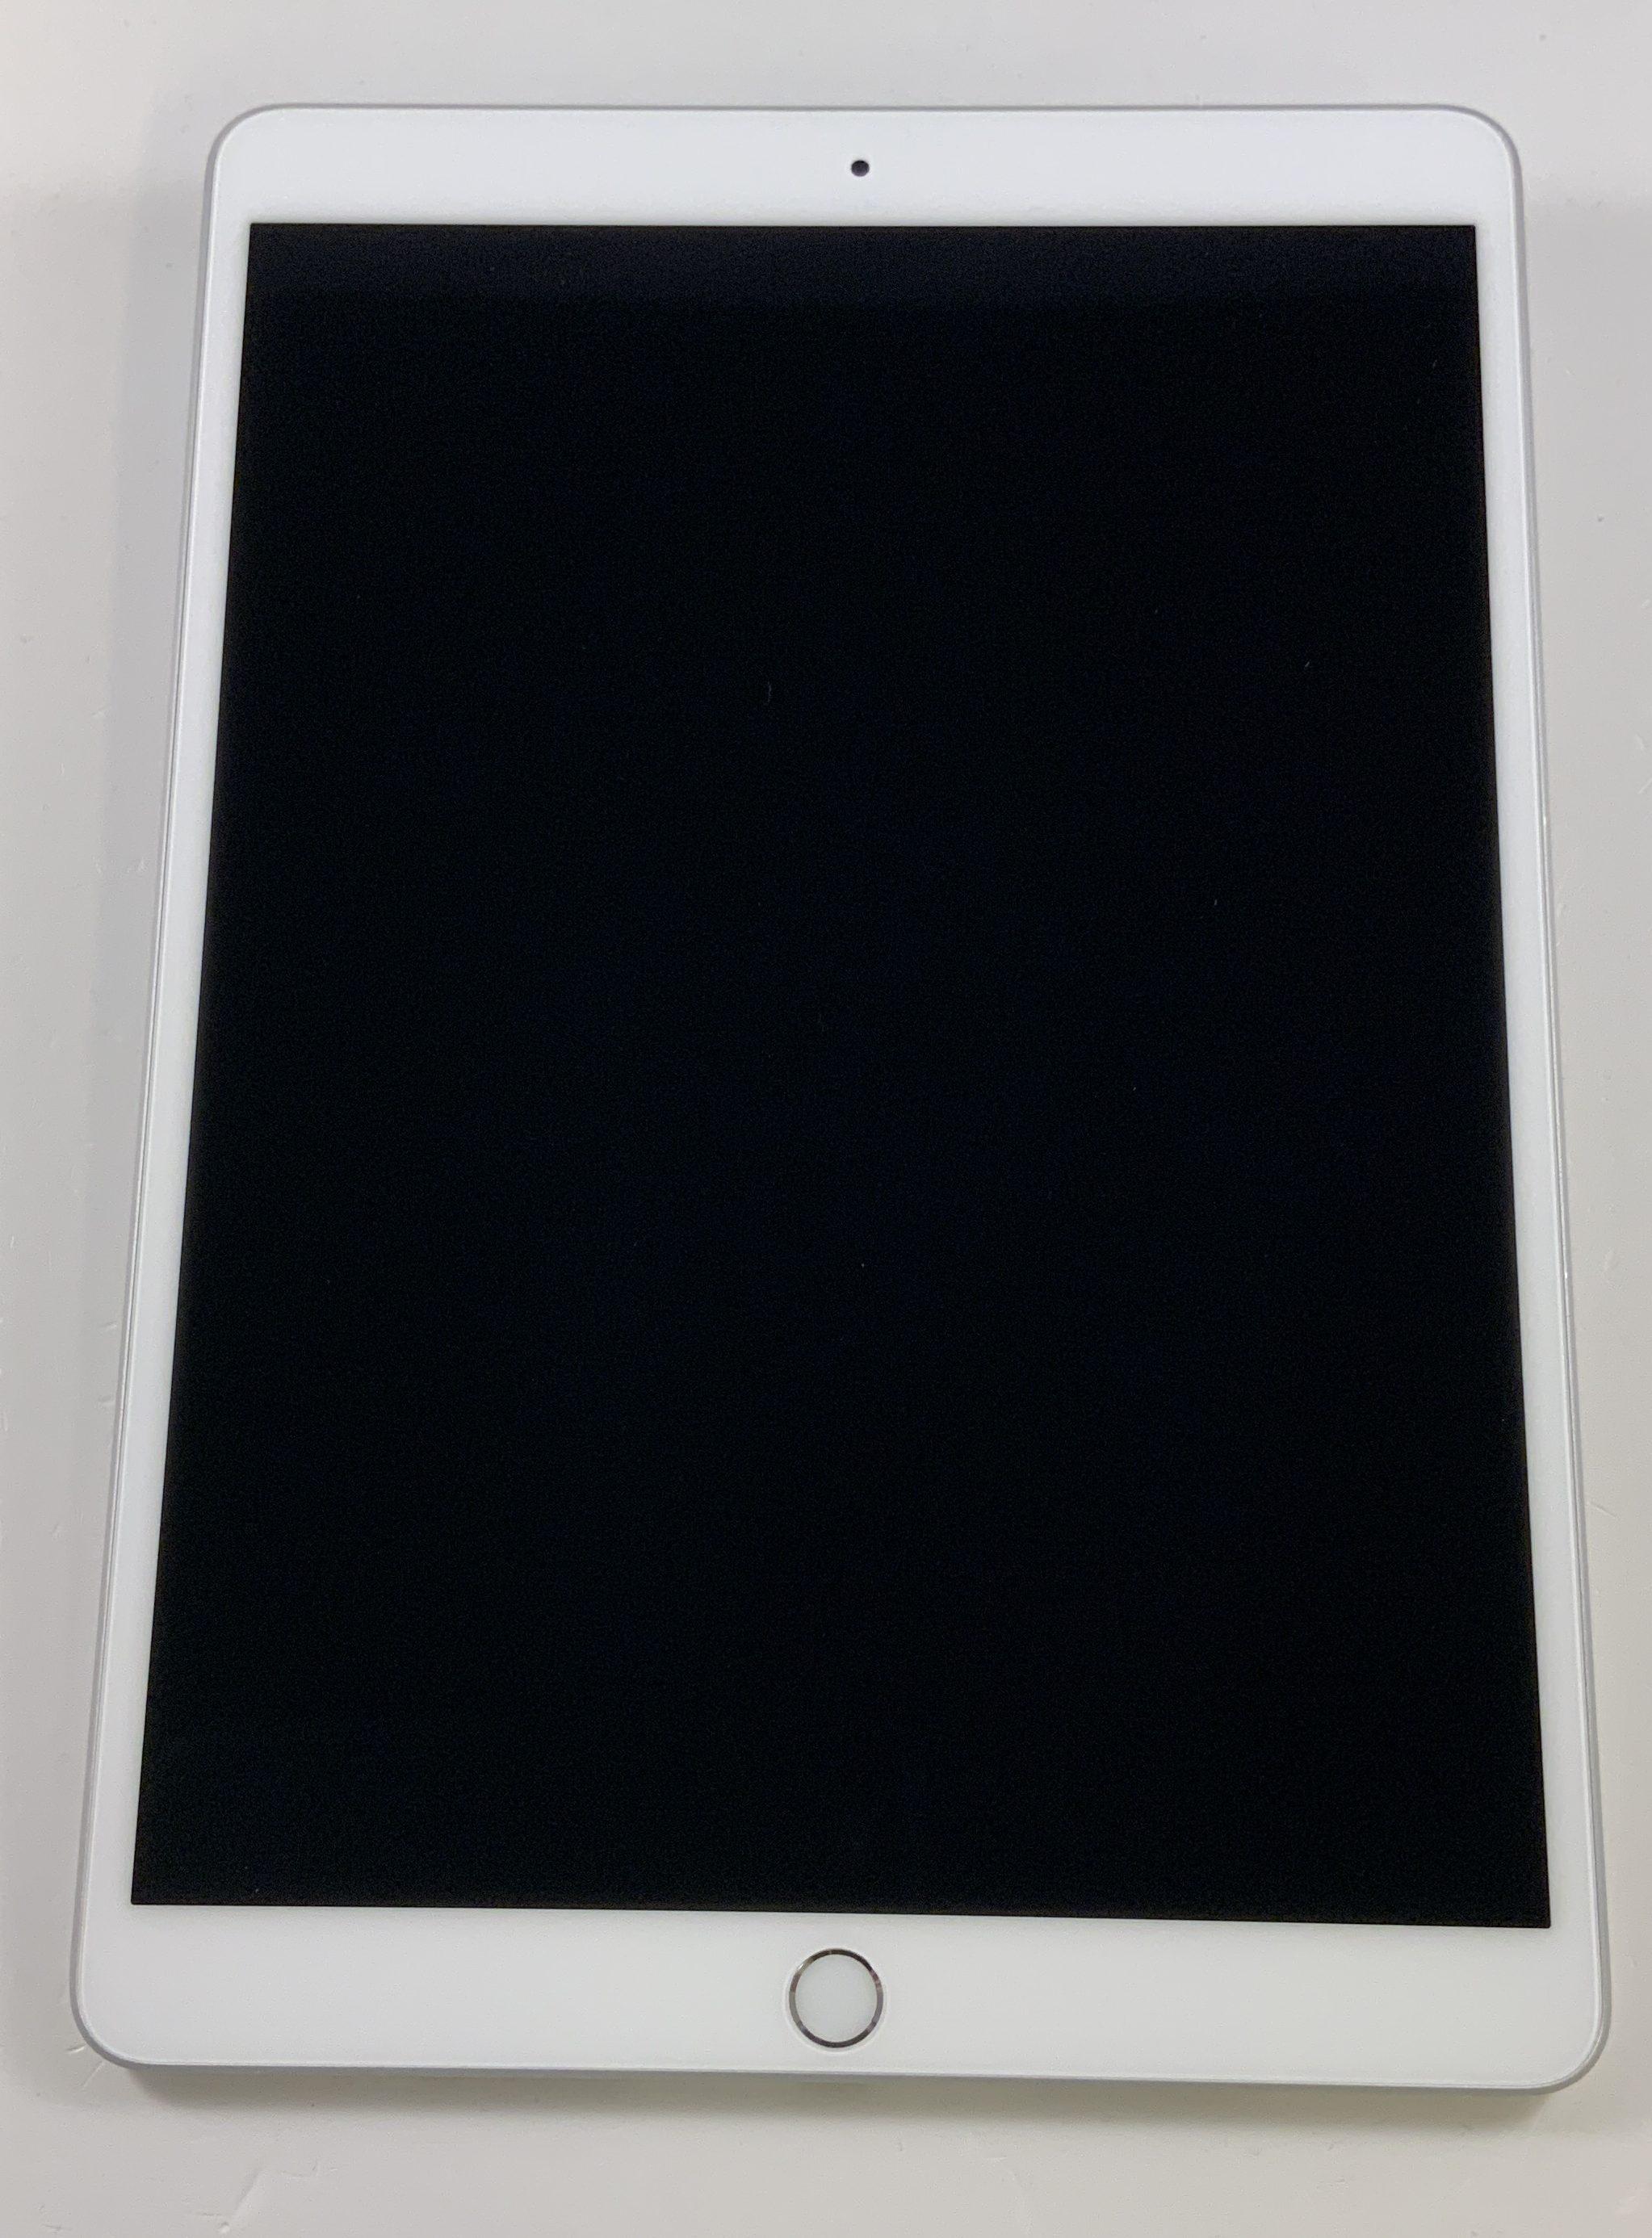 iPad Air 3 Wi-Fi + Cellular 64GB, 64GB, Silver, bild 1